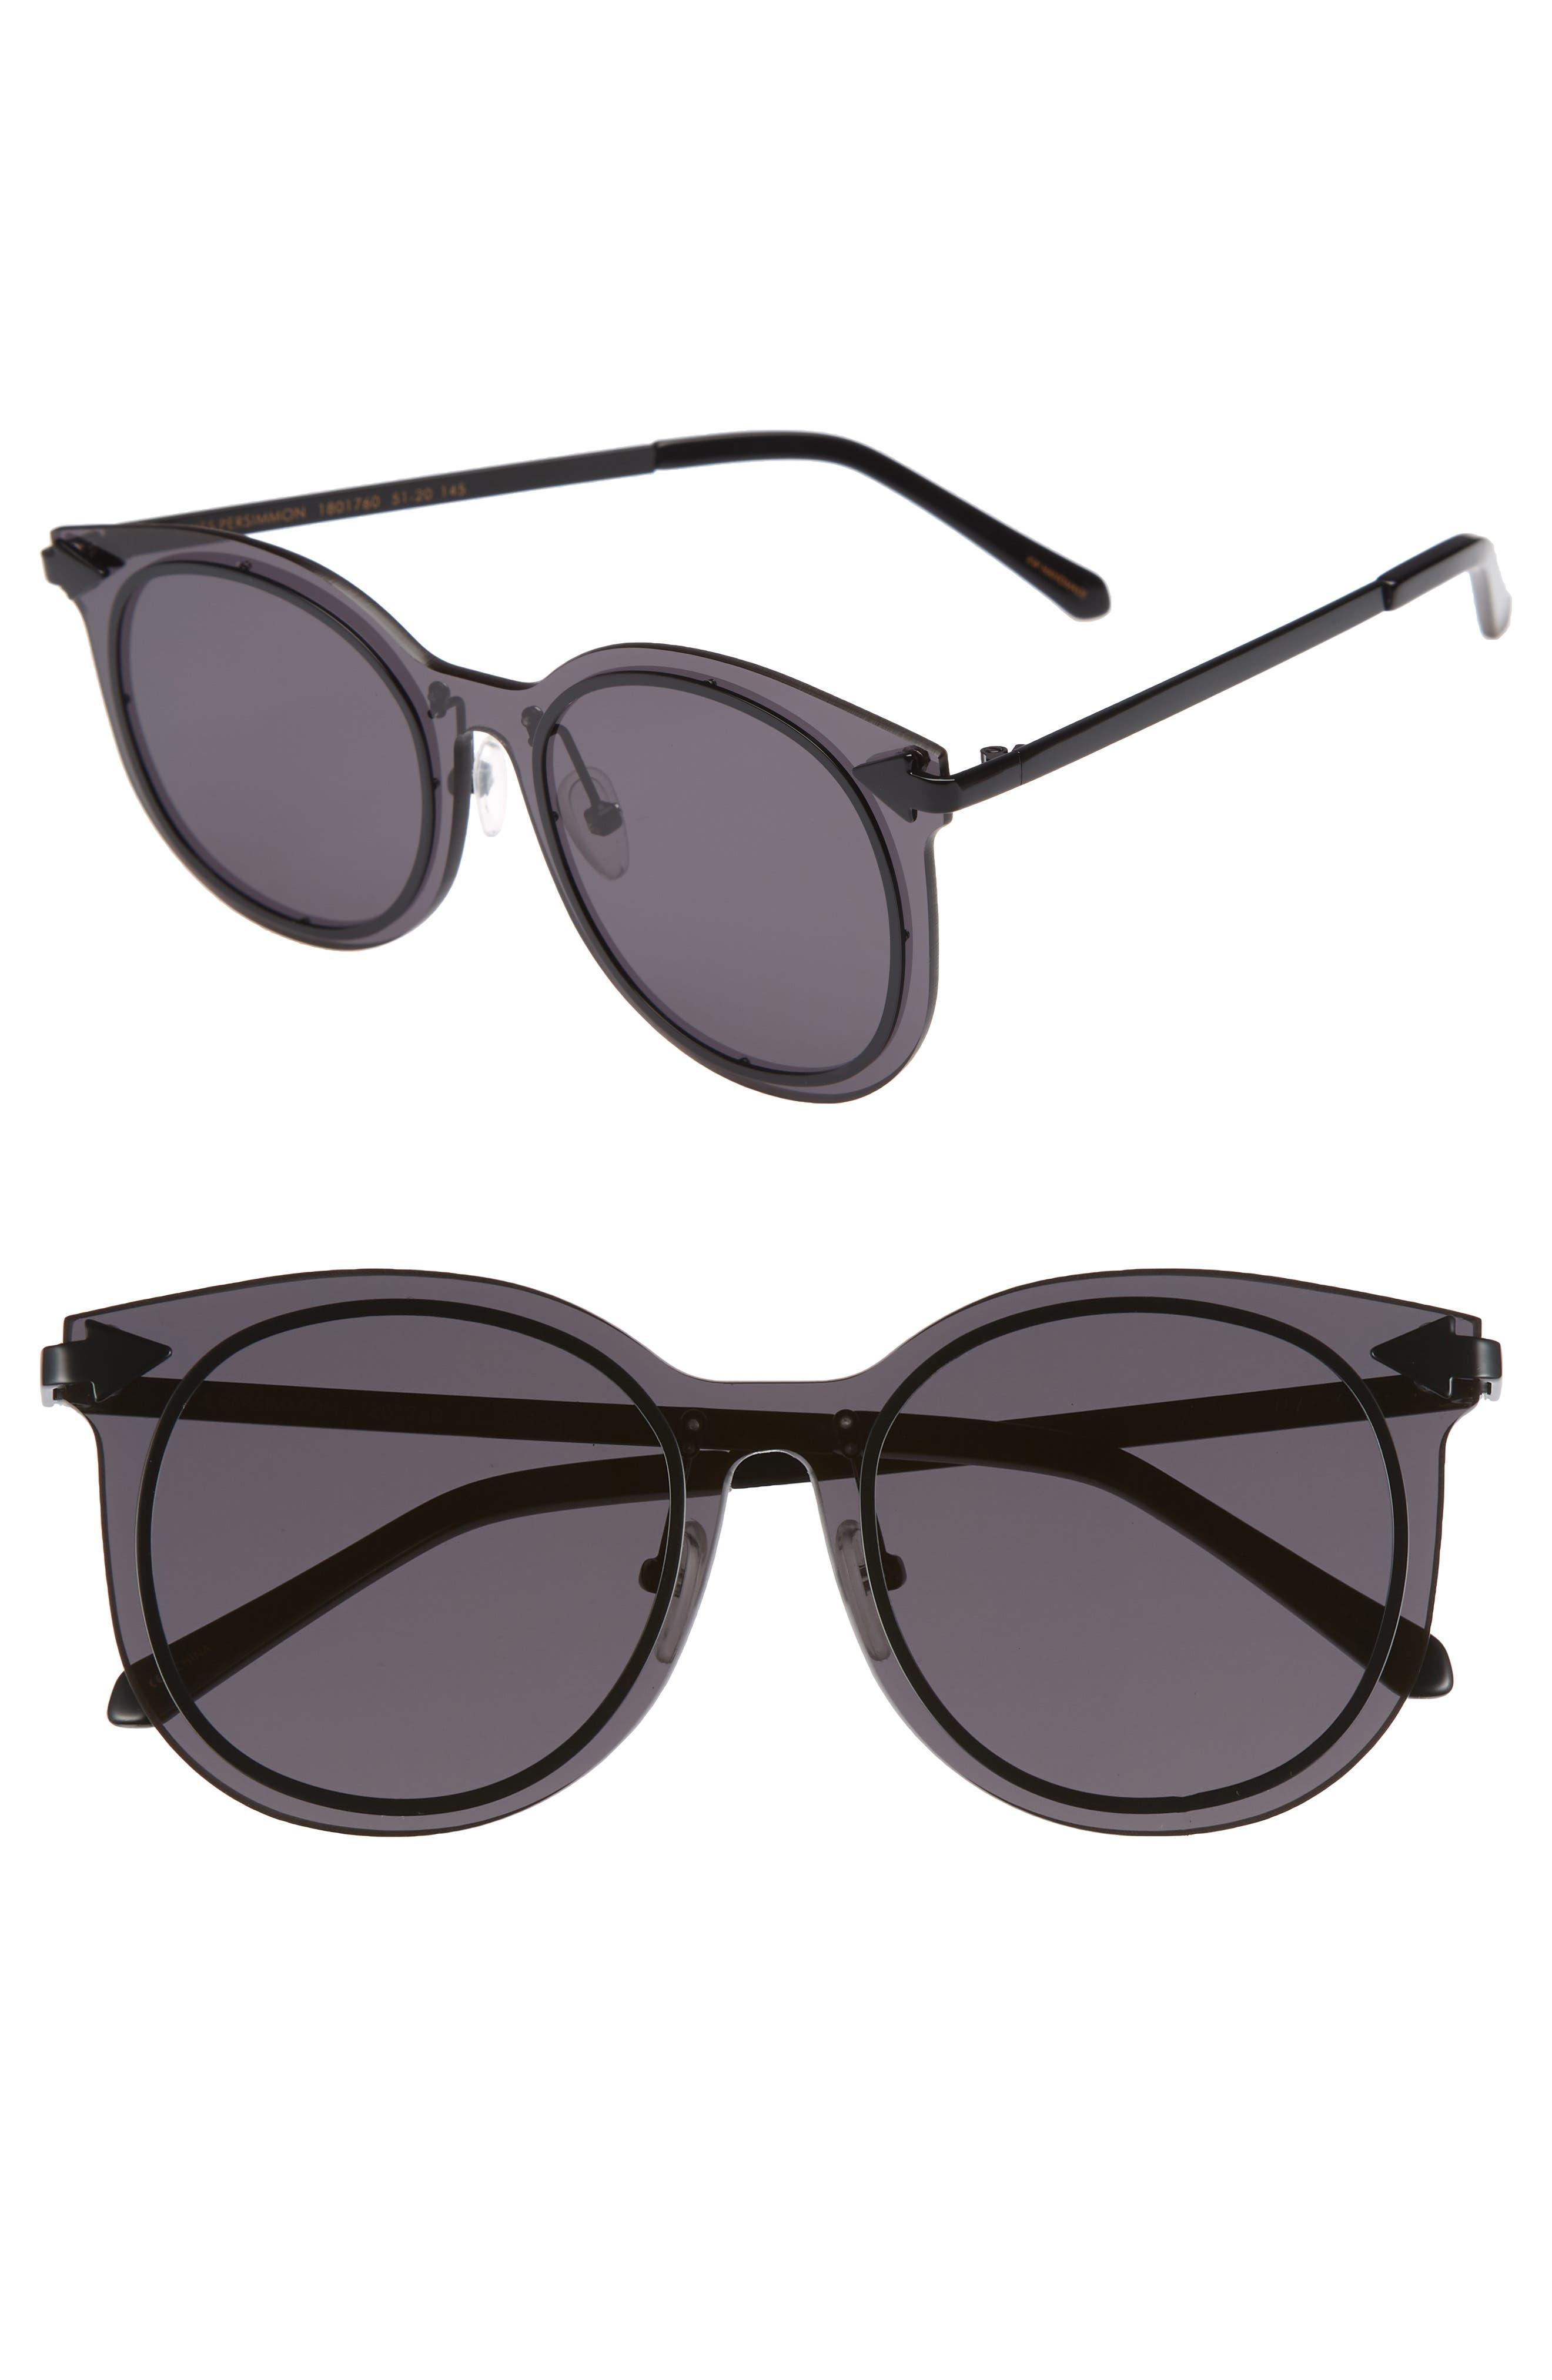 Miss Persimmon 51mm Sunglasses,                         Main,                         color, Black